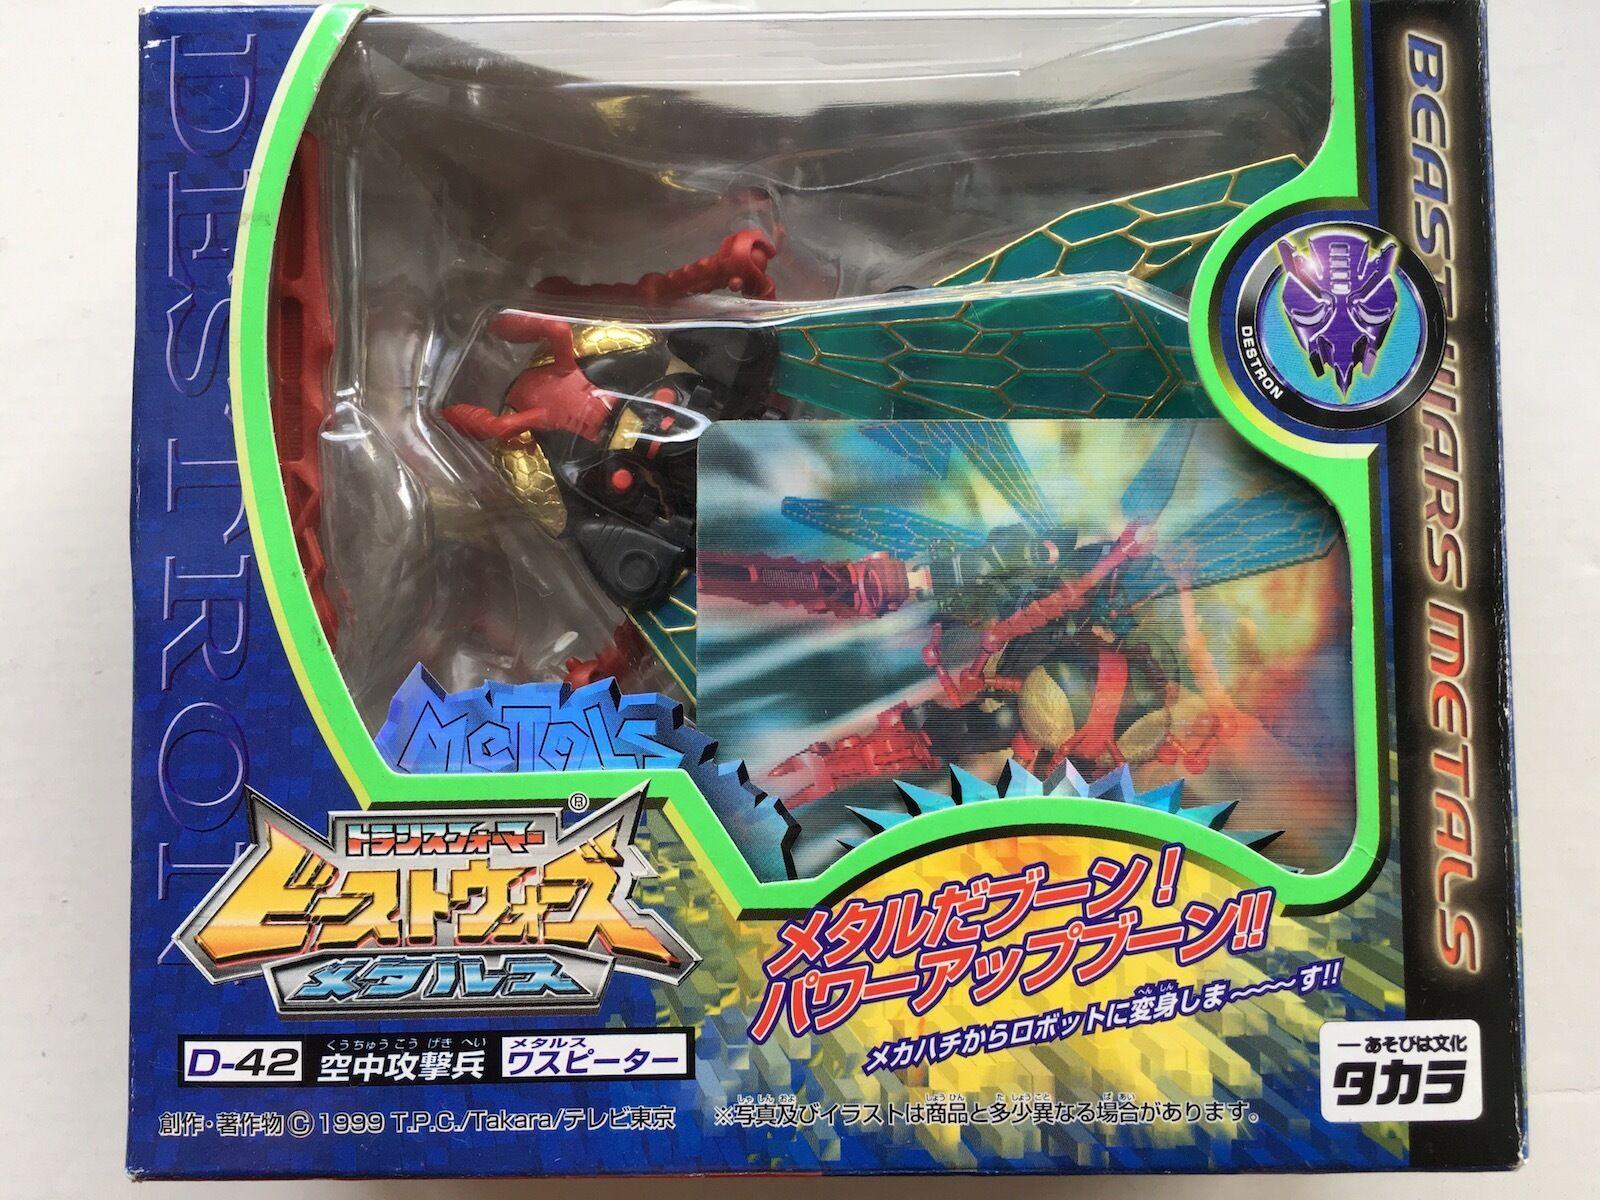 Japan Rare Transformers Beast Wars Metals D-42 Metals Waspinator Action Figure